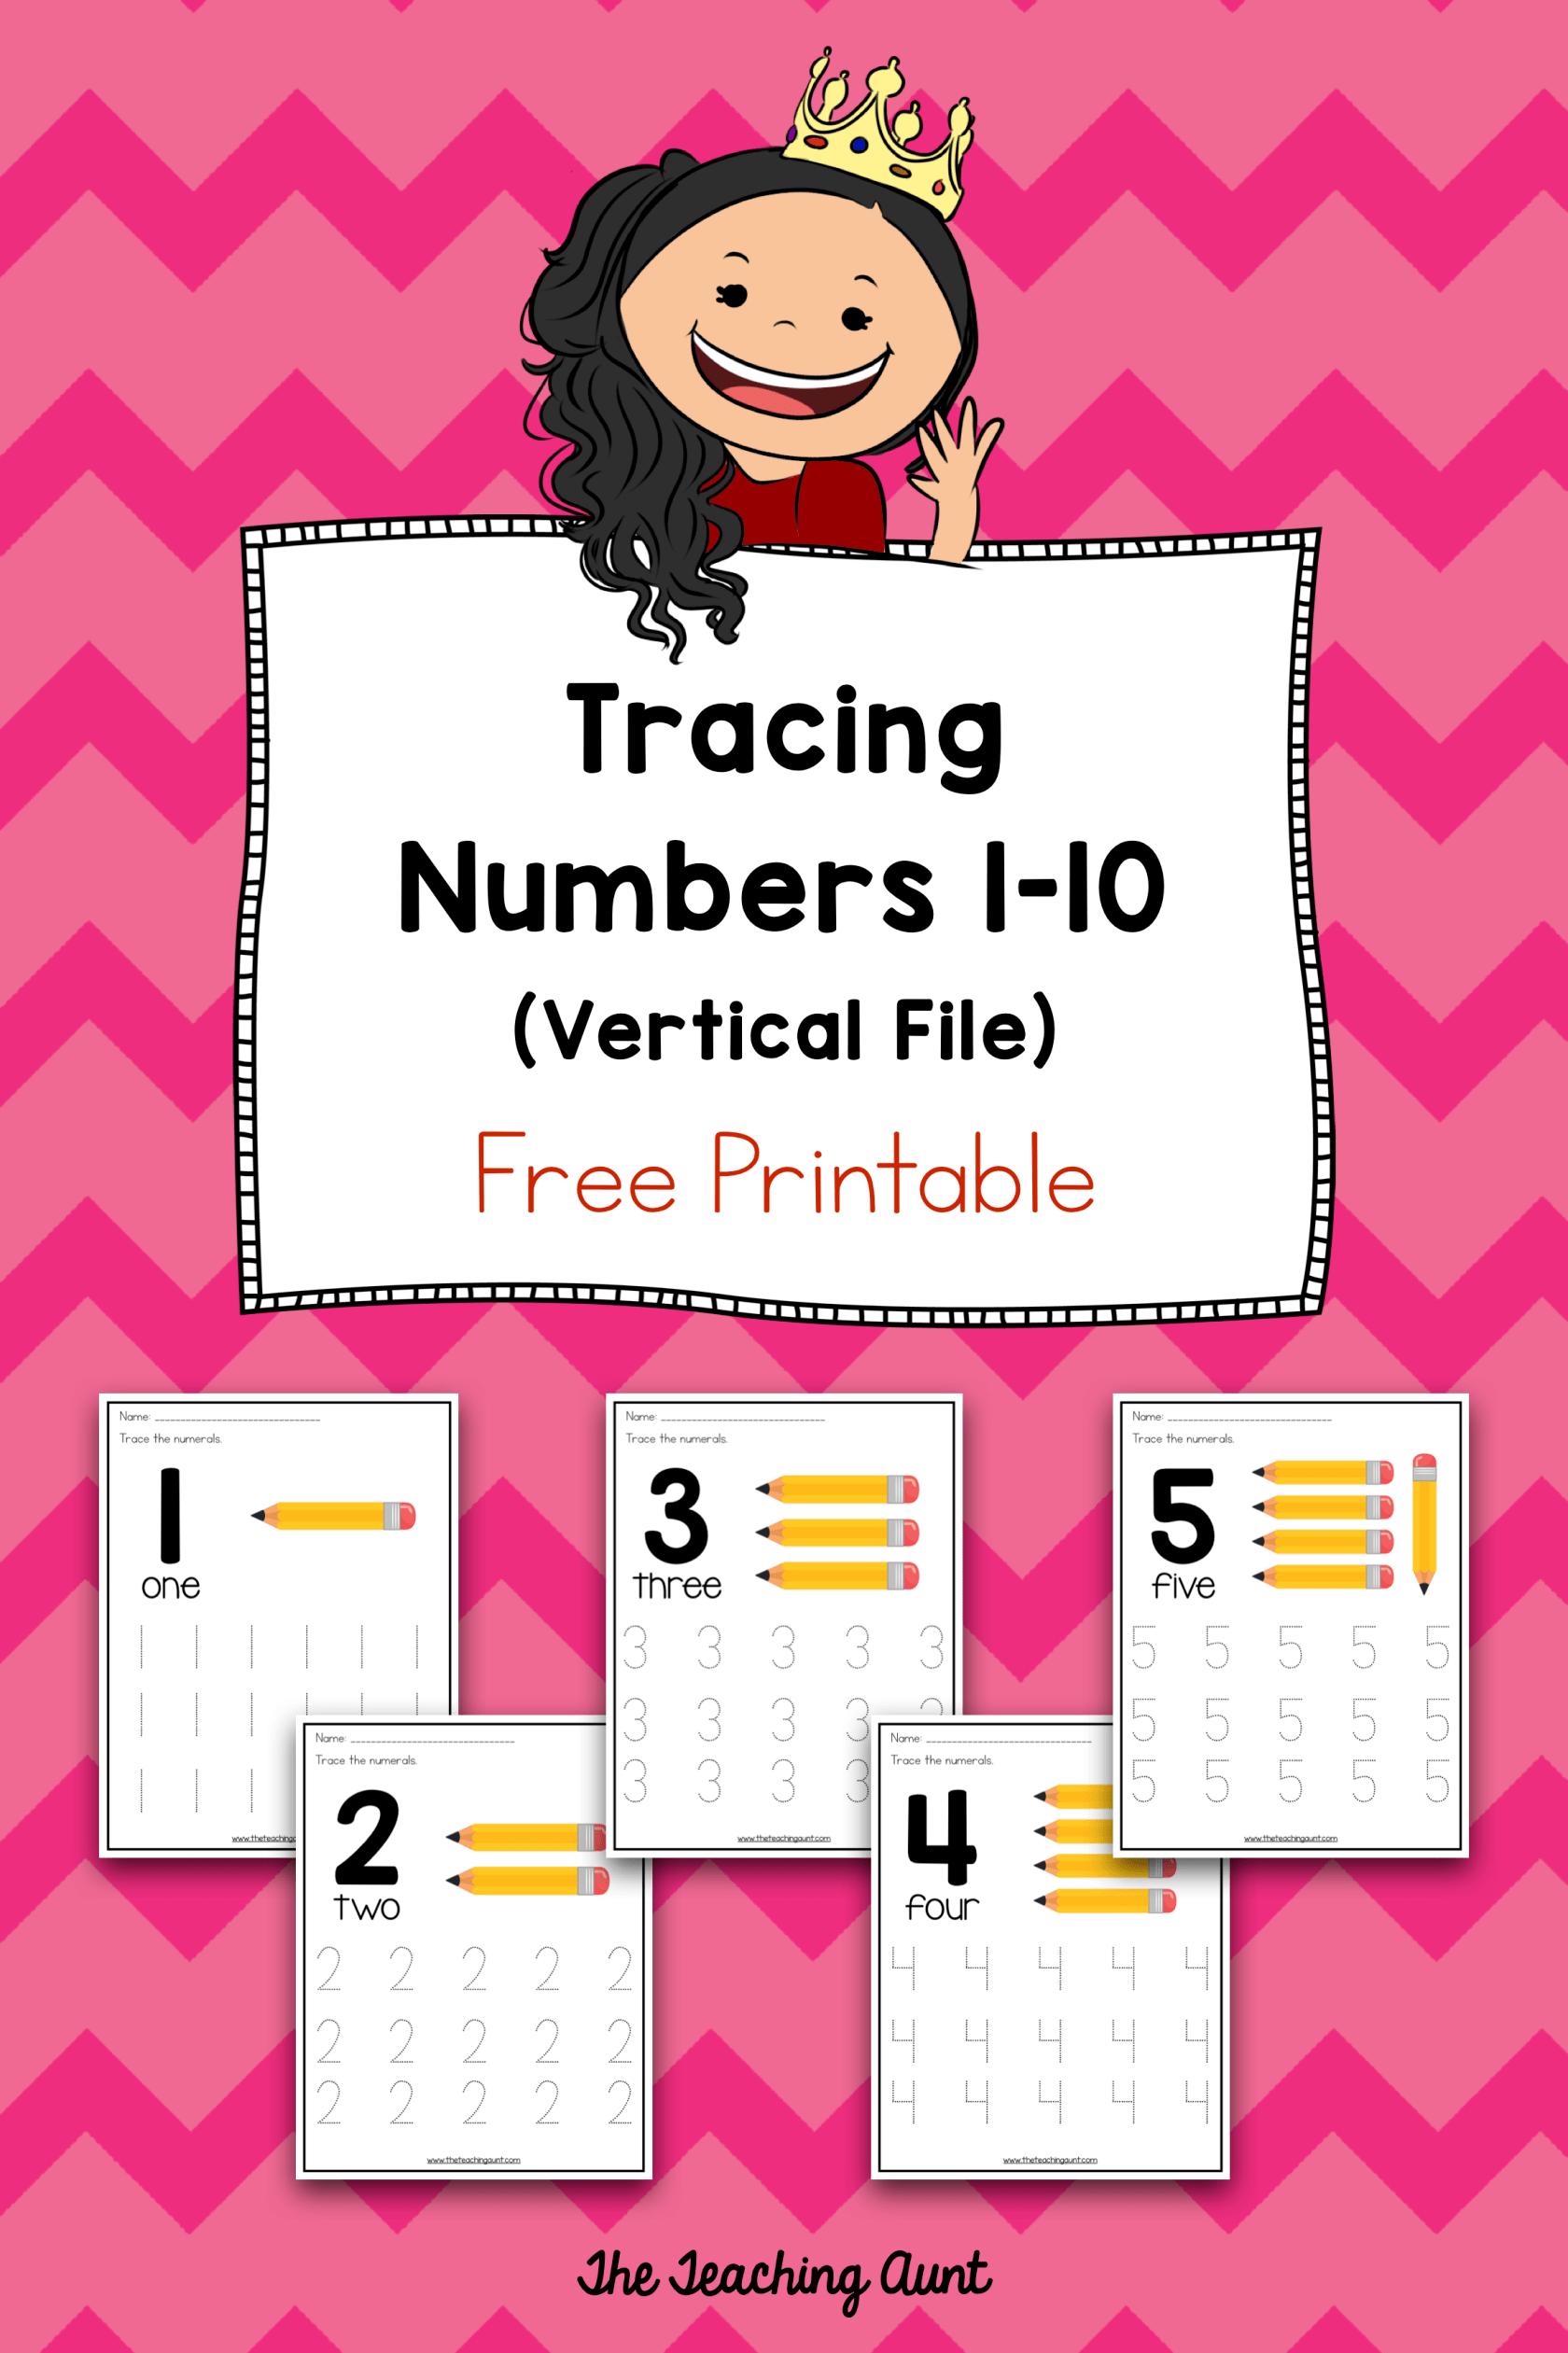 Number Tracing Worksheets For Preschoolers